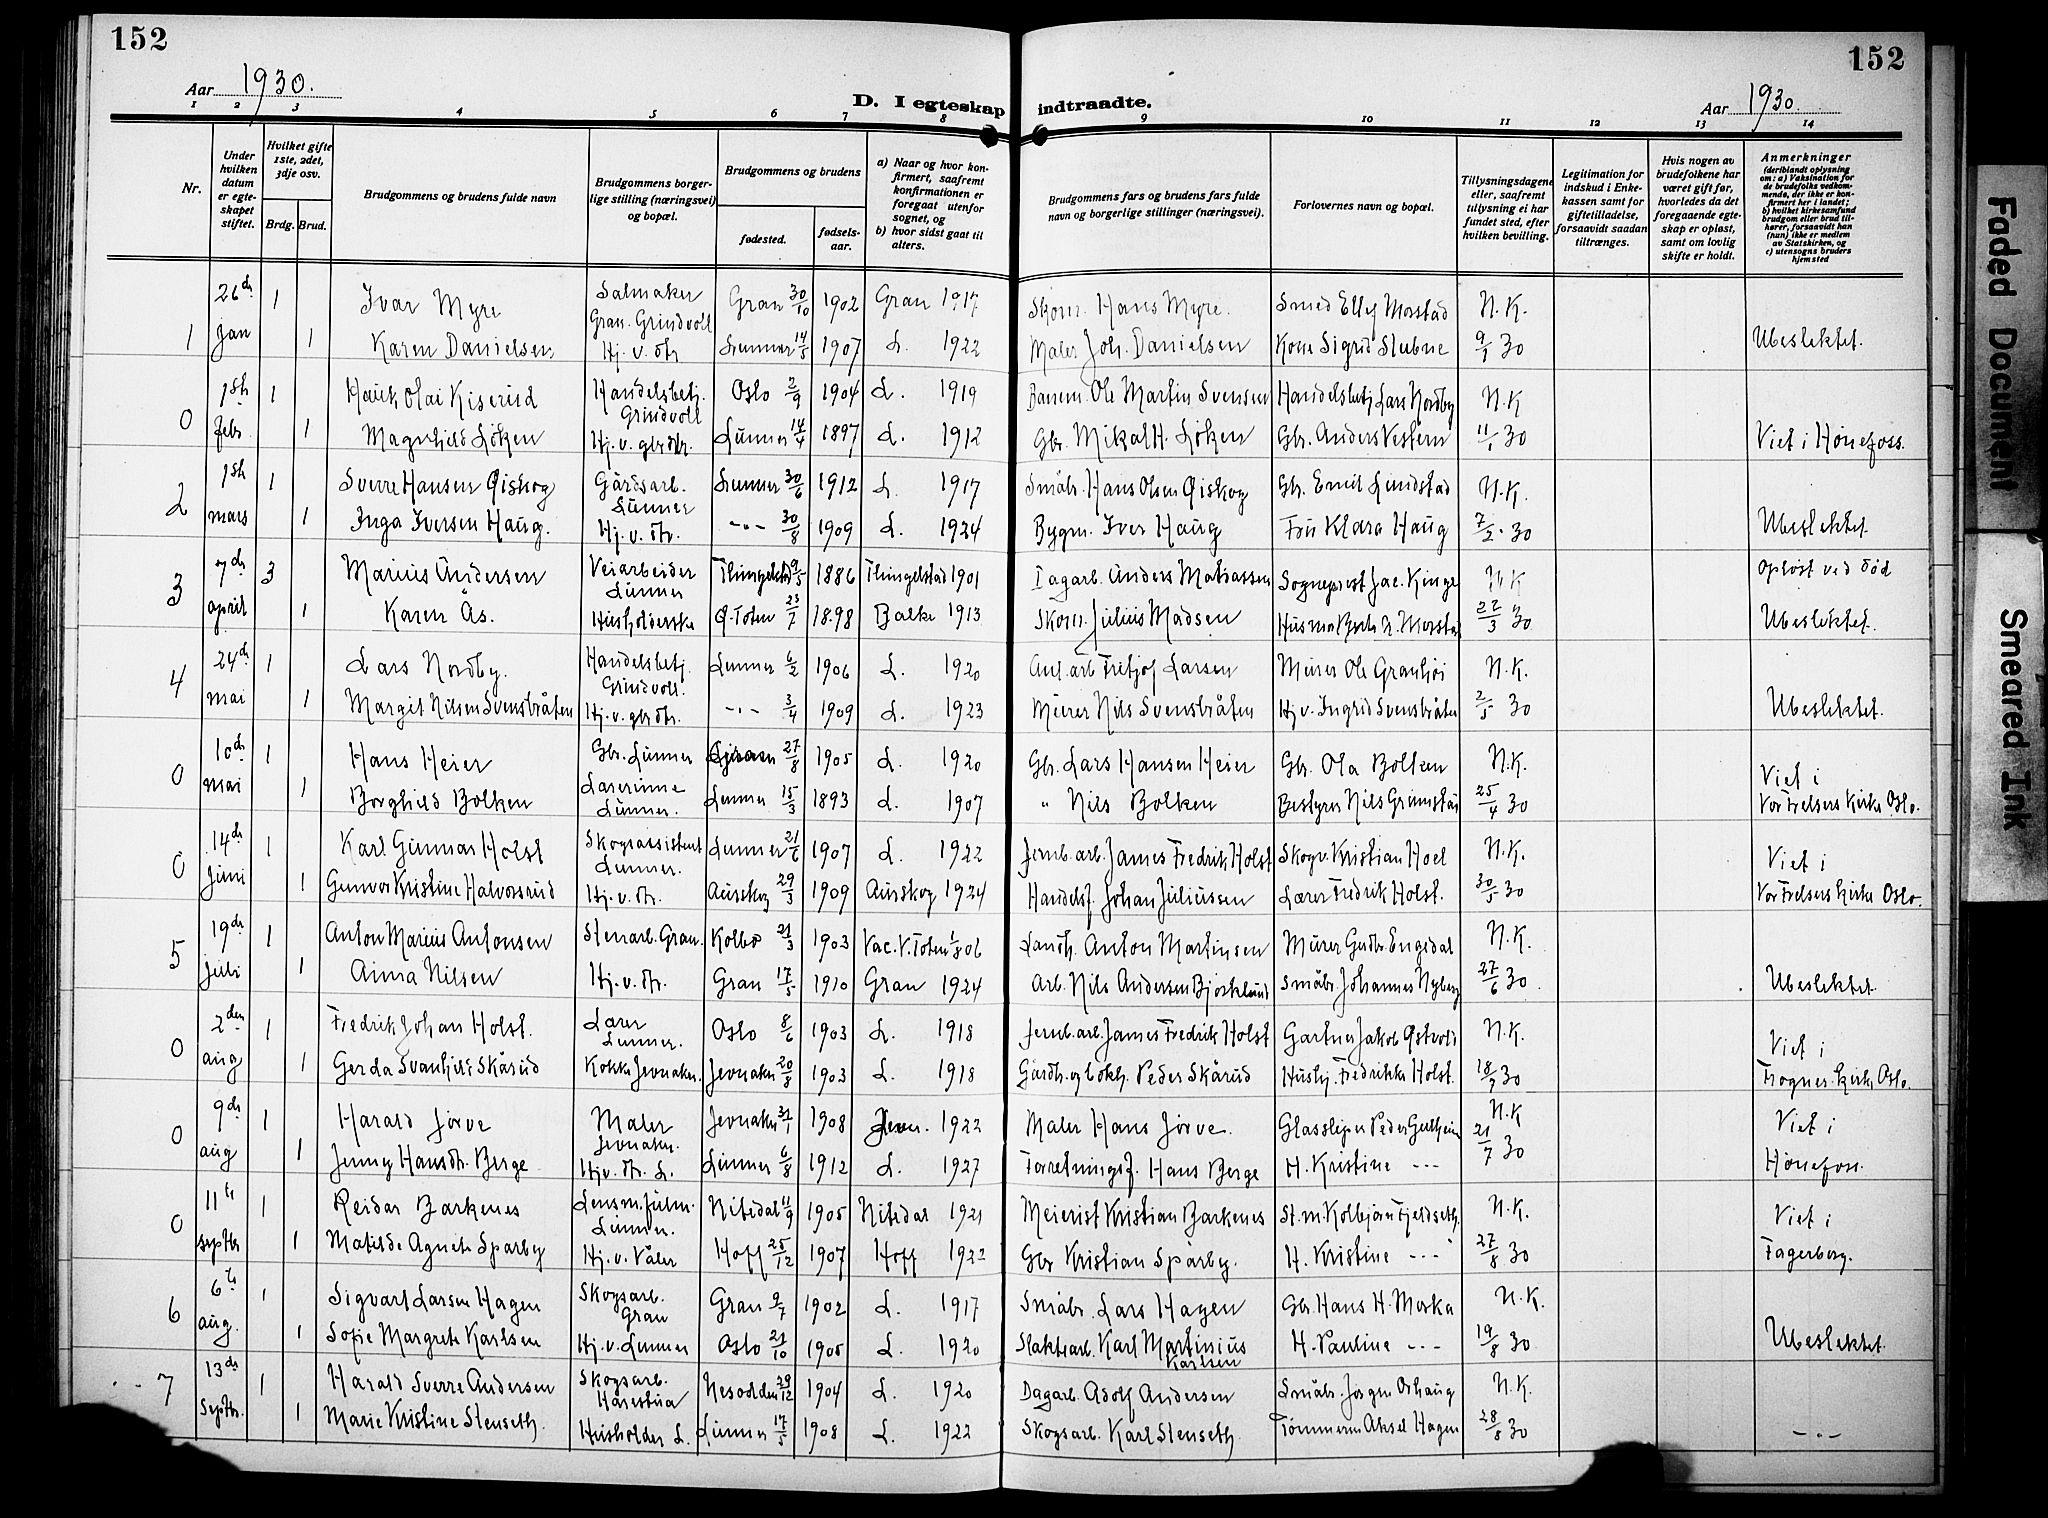 SAH, Lunner prestekontor, H/Ha/Hab/L0002: Klokkerbok nr. 2, 1923-1933, s. 152